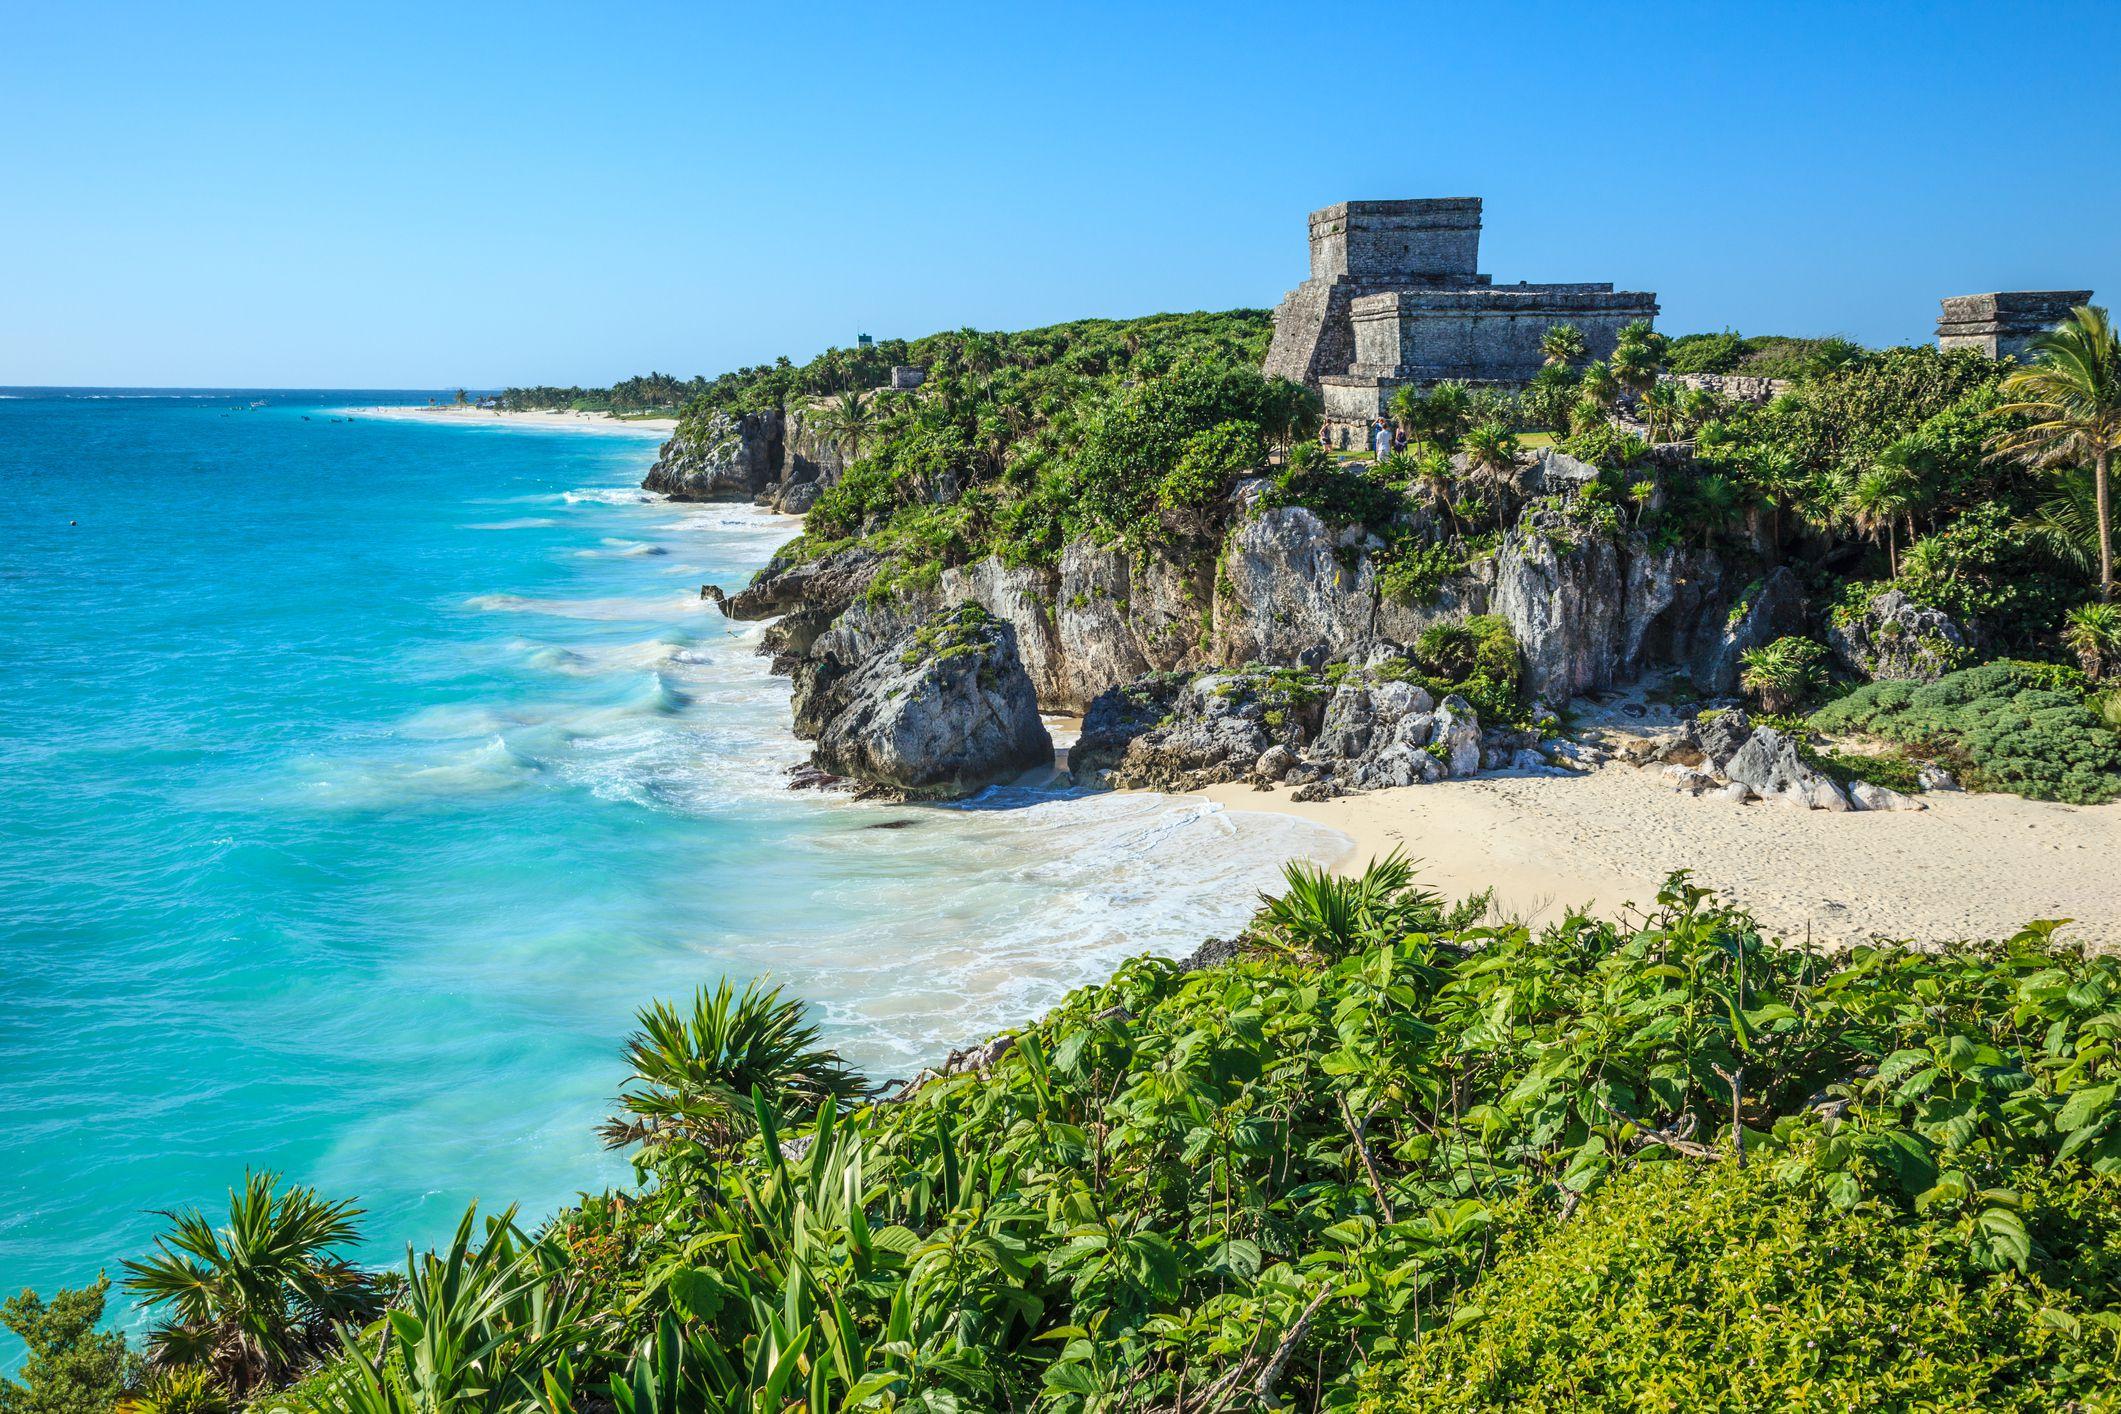 The 8 Best Family Friendly Riviera Maya Resorts of 2019